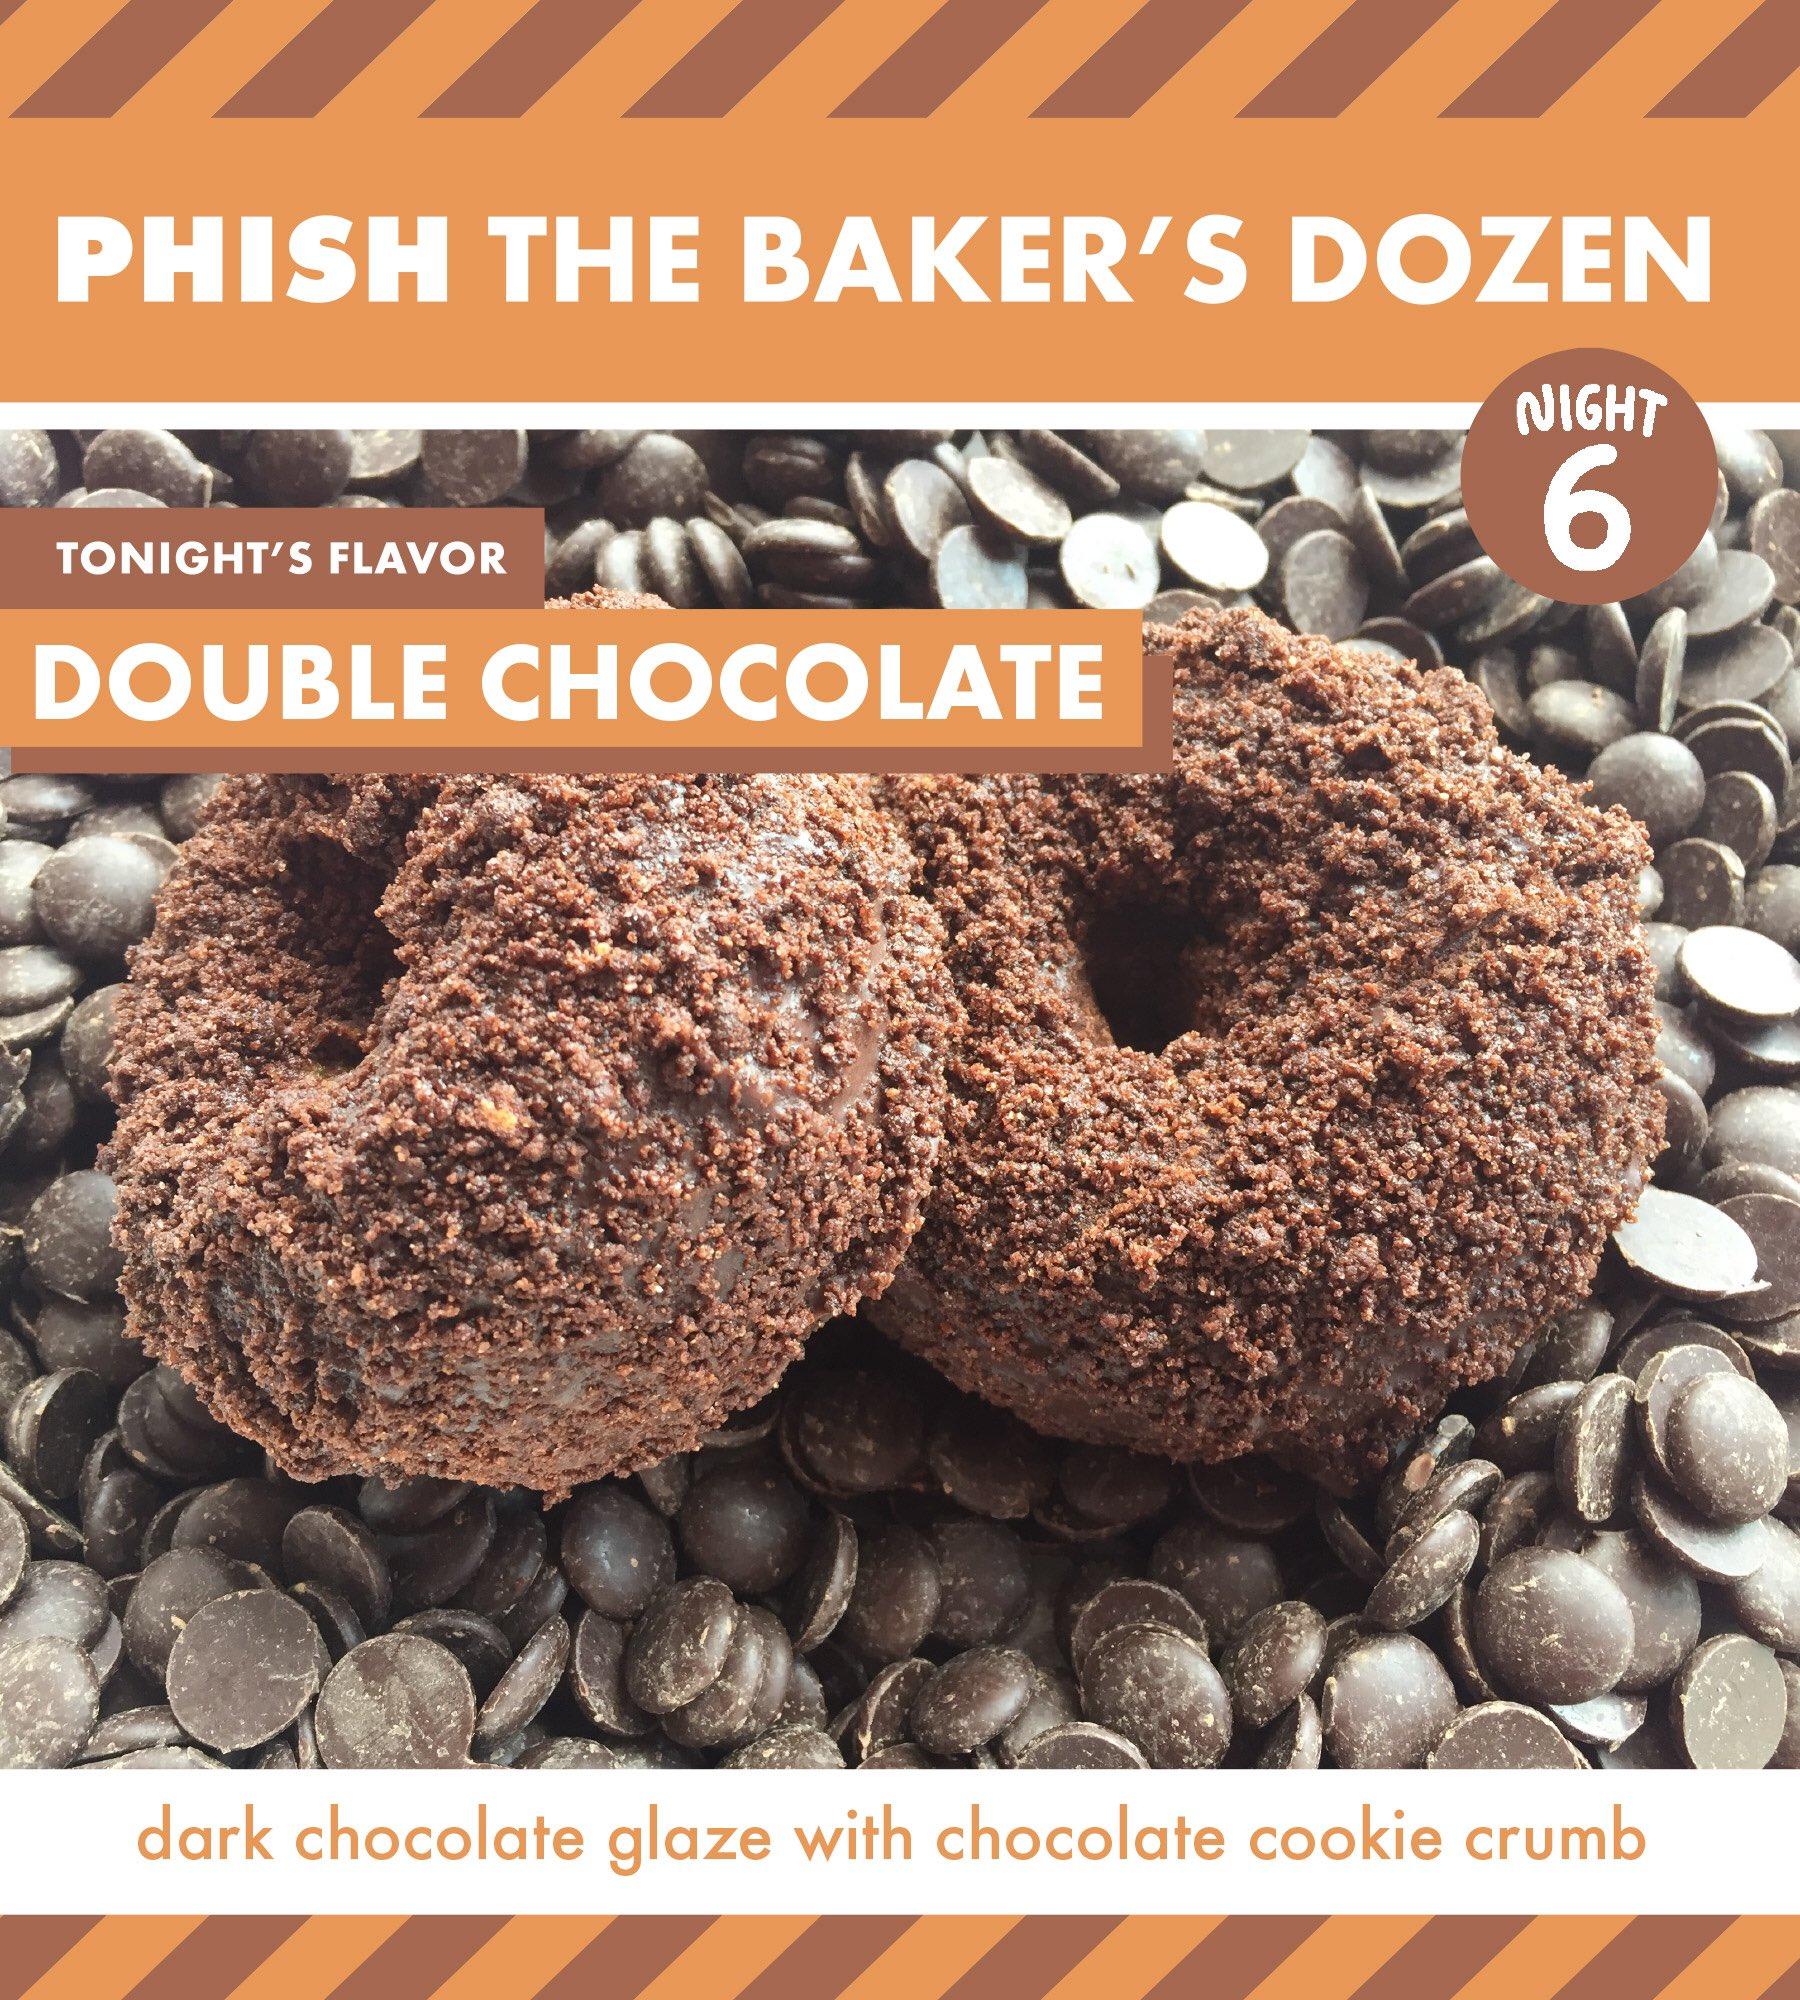 Phish.Net: DOUBLE CHOCOLATE